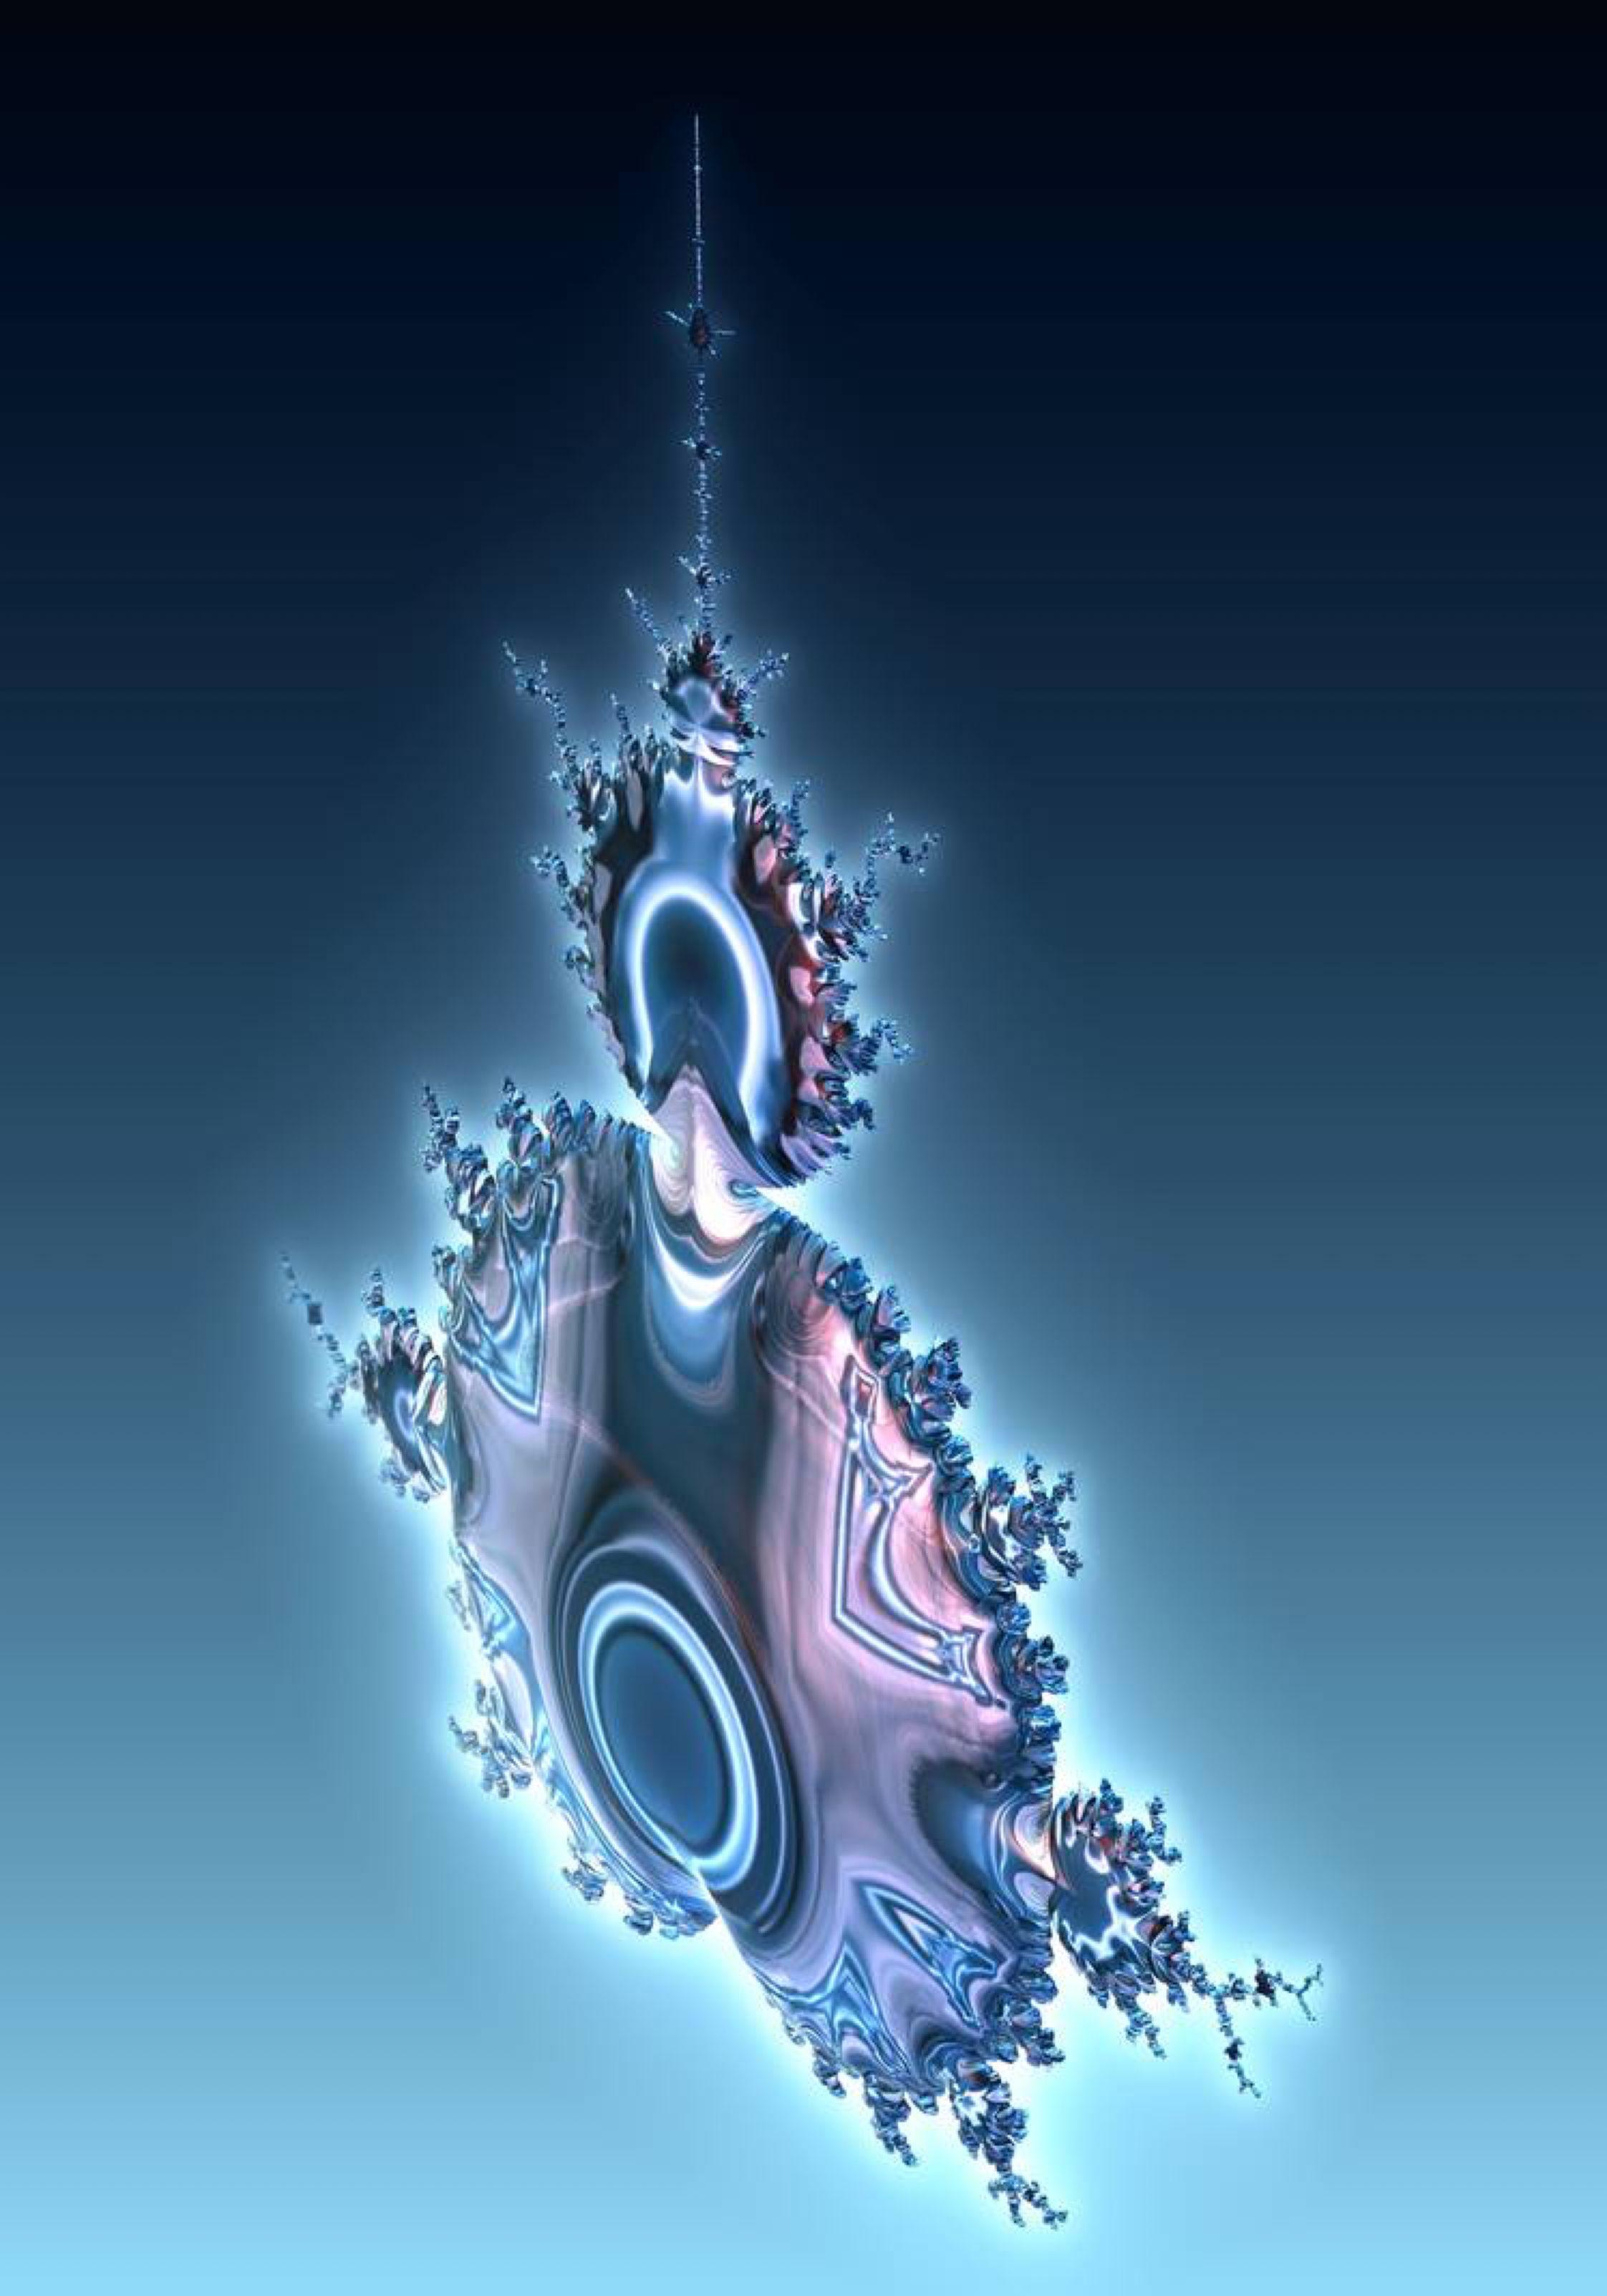 3D Mandelbrot Set - Bulbic Dream {by Metafractals on DeviantArt ...